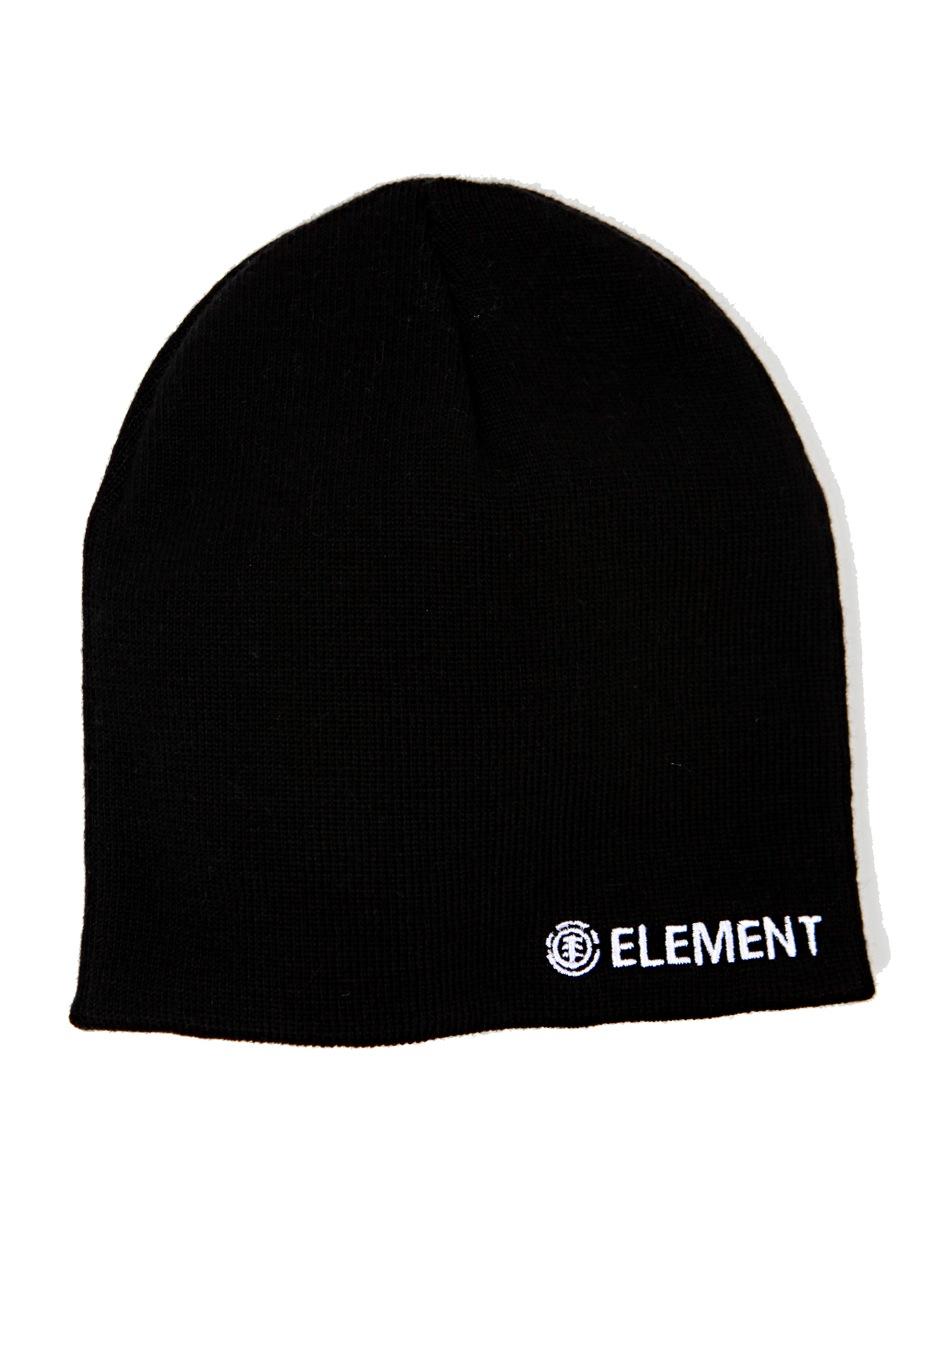 Element - Dock - Beanie - Impericon.com UK 28ba1f4b734e